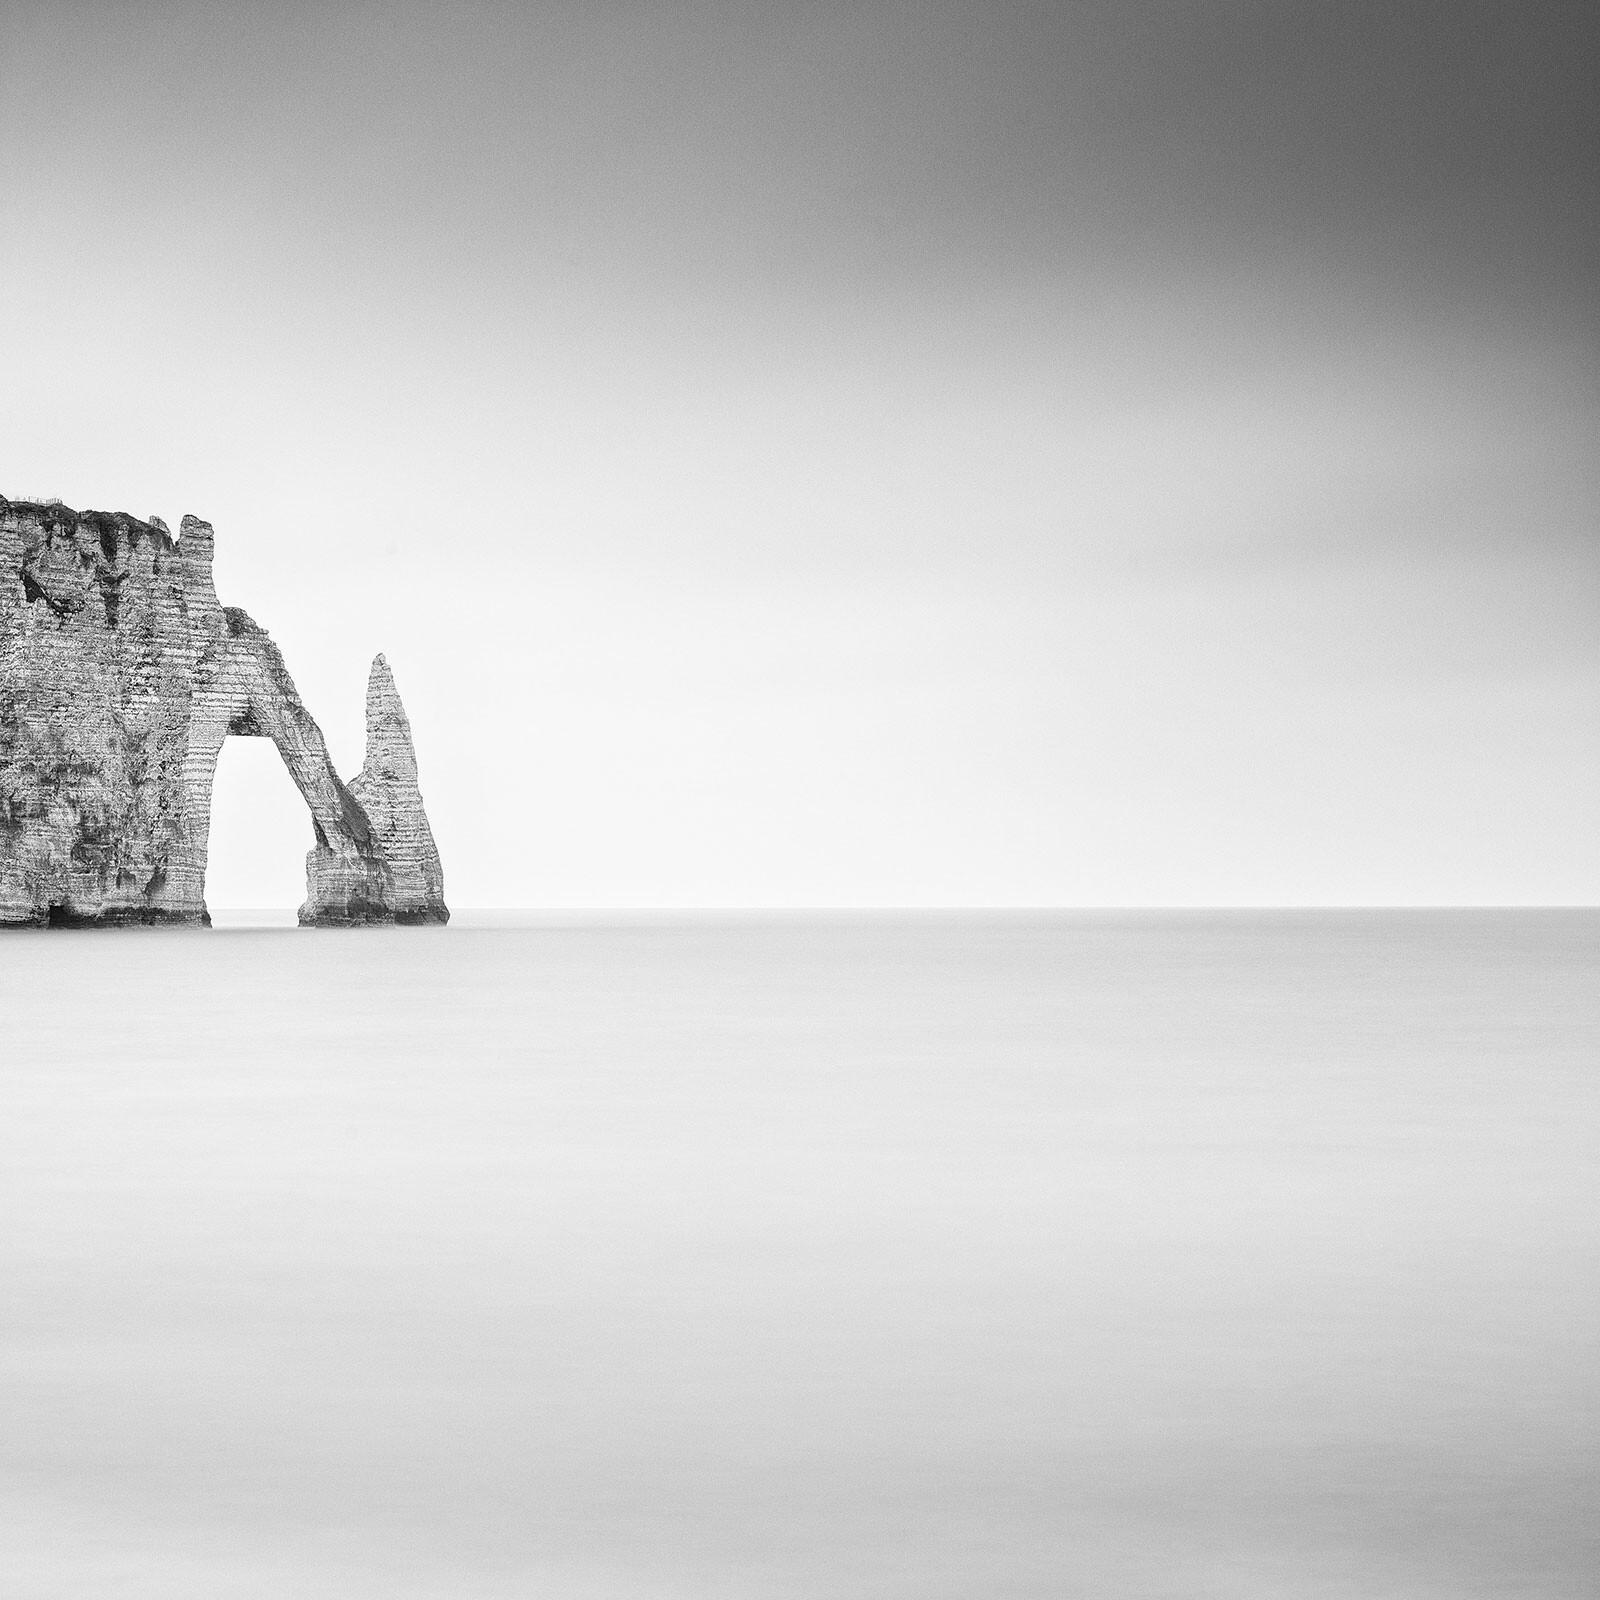 L'Arche d'Aval - Wilco Dragt